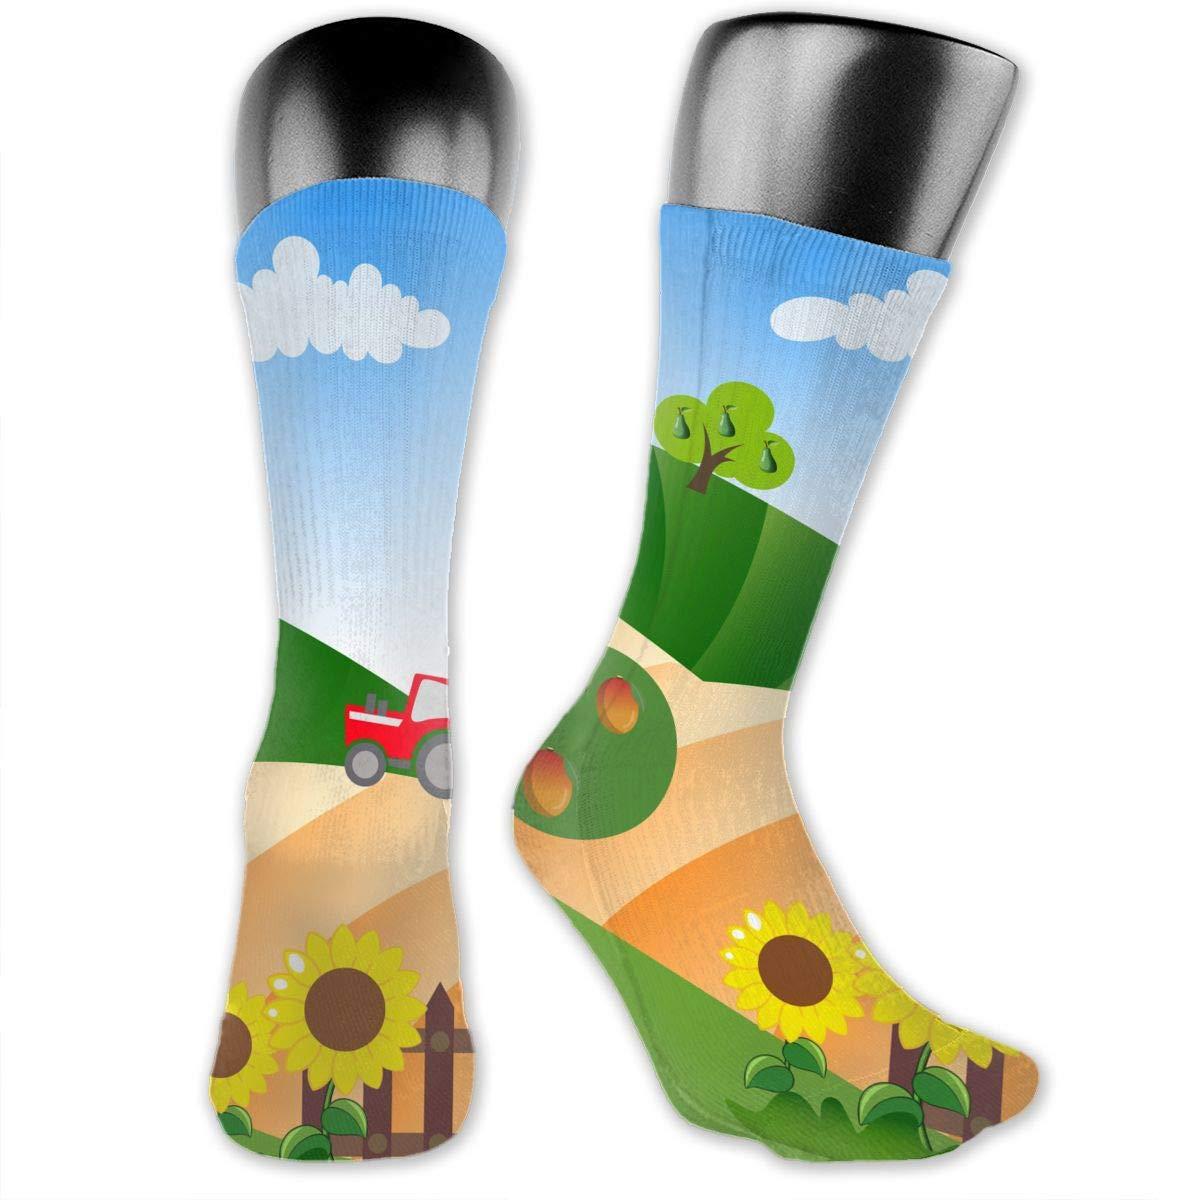 OLGCZM Farm Pattern Men Womens Thin High Ankle Casual Socks Fit Outdoor Hiking Trail